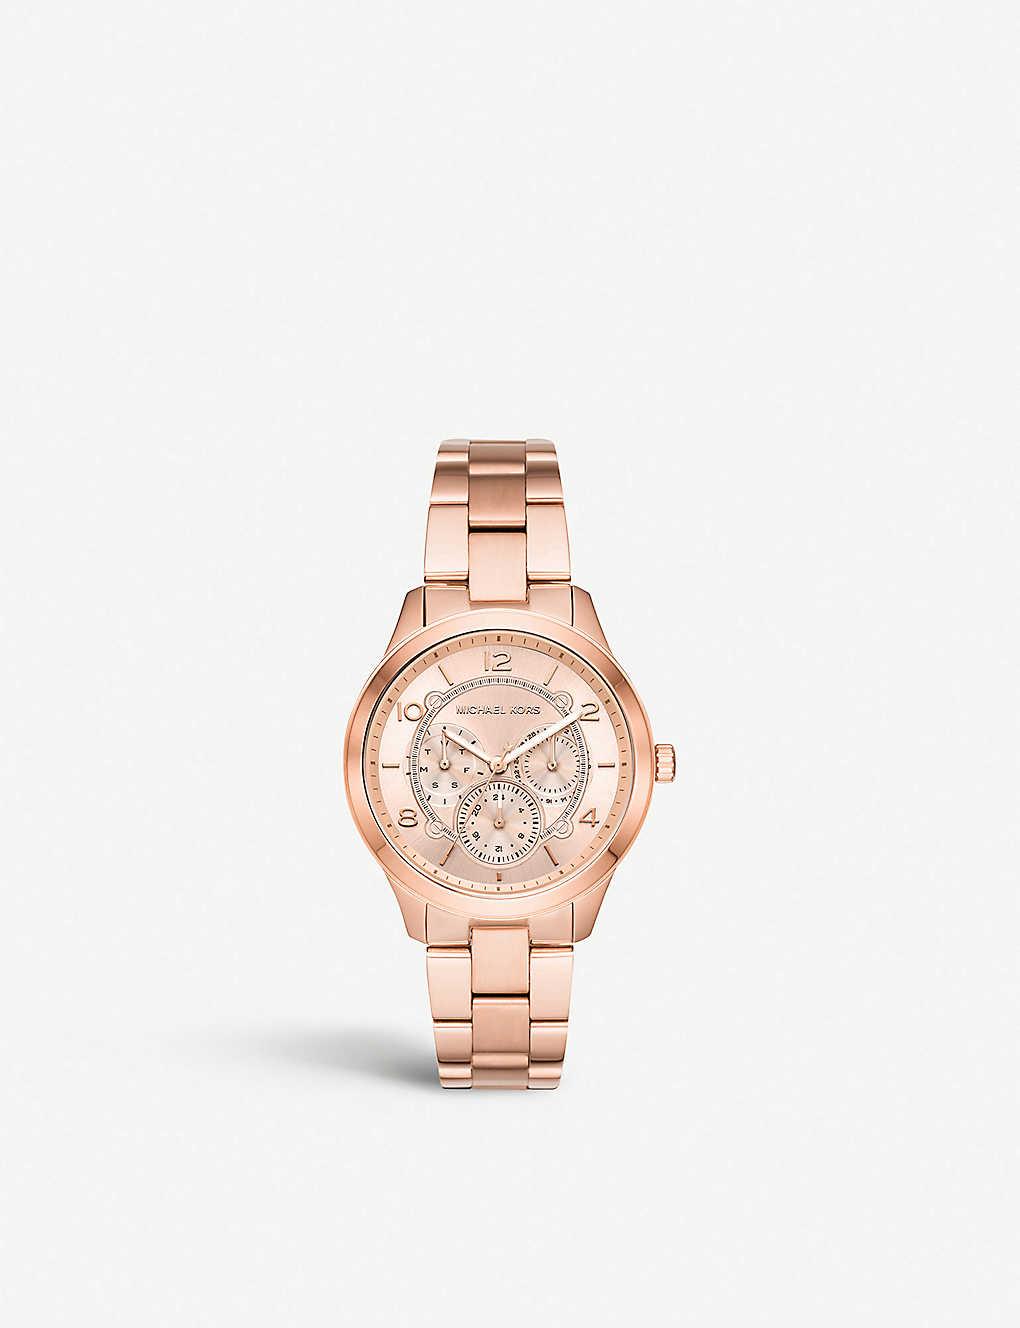 bb83b7b5eb28 MICHAEL KORS - MK3983 Jet Set rose-gold stainless steel chronograph ...